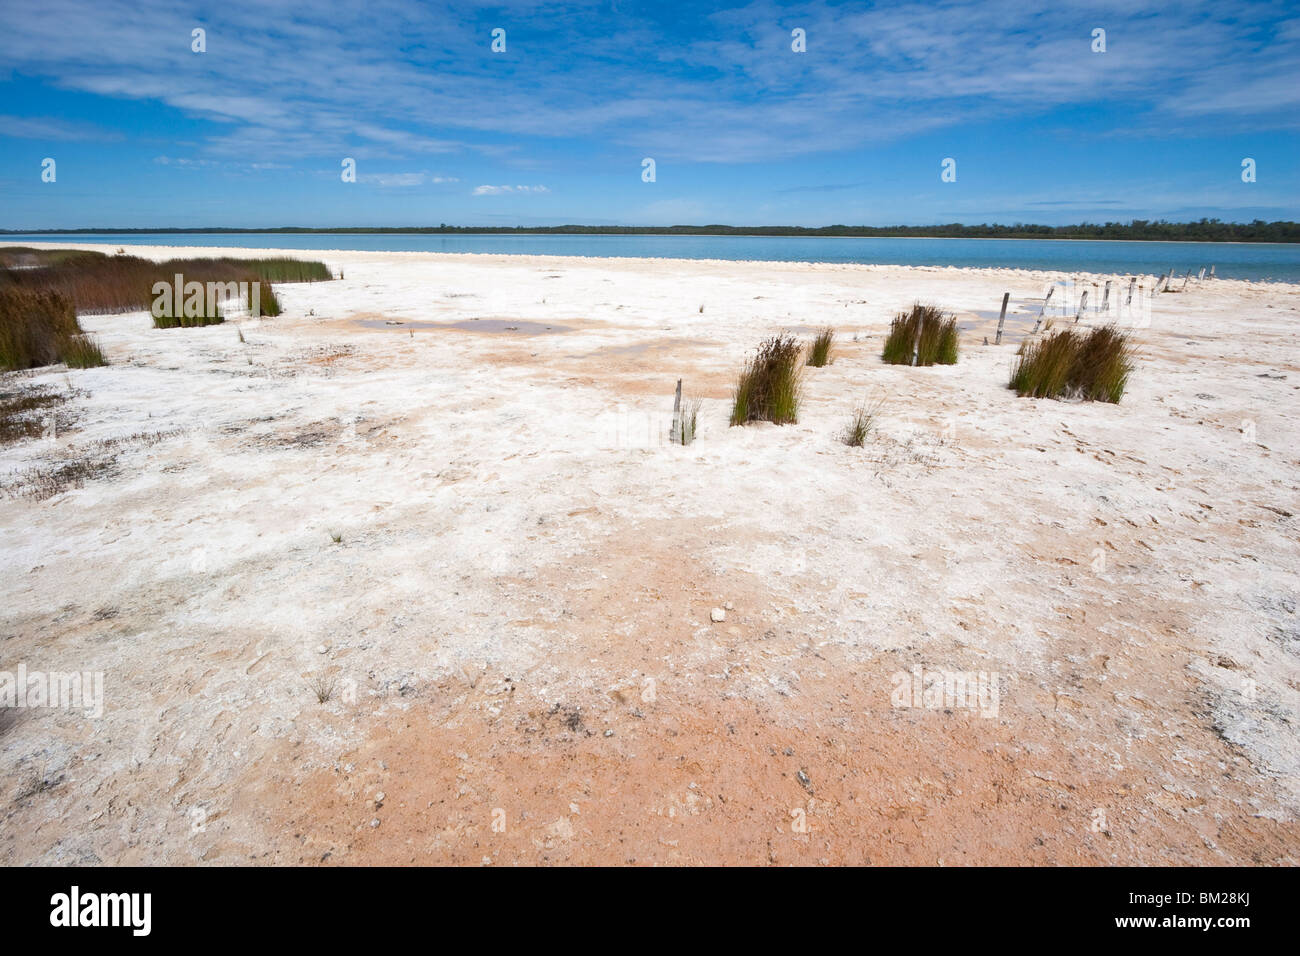 Sale e depositi di alghe in riva al lago di Clifton, Yalgorup National Park, Mandurah, Australia occidentale Immagini Stock